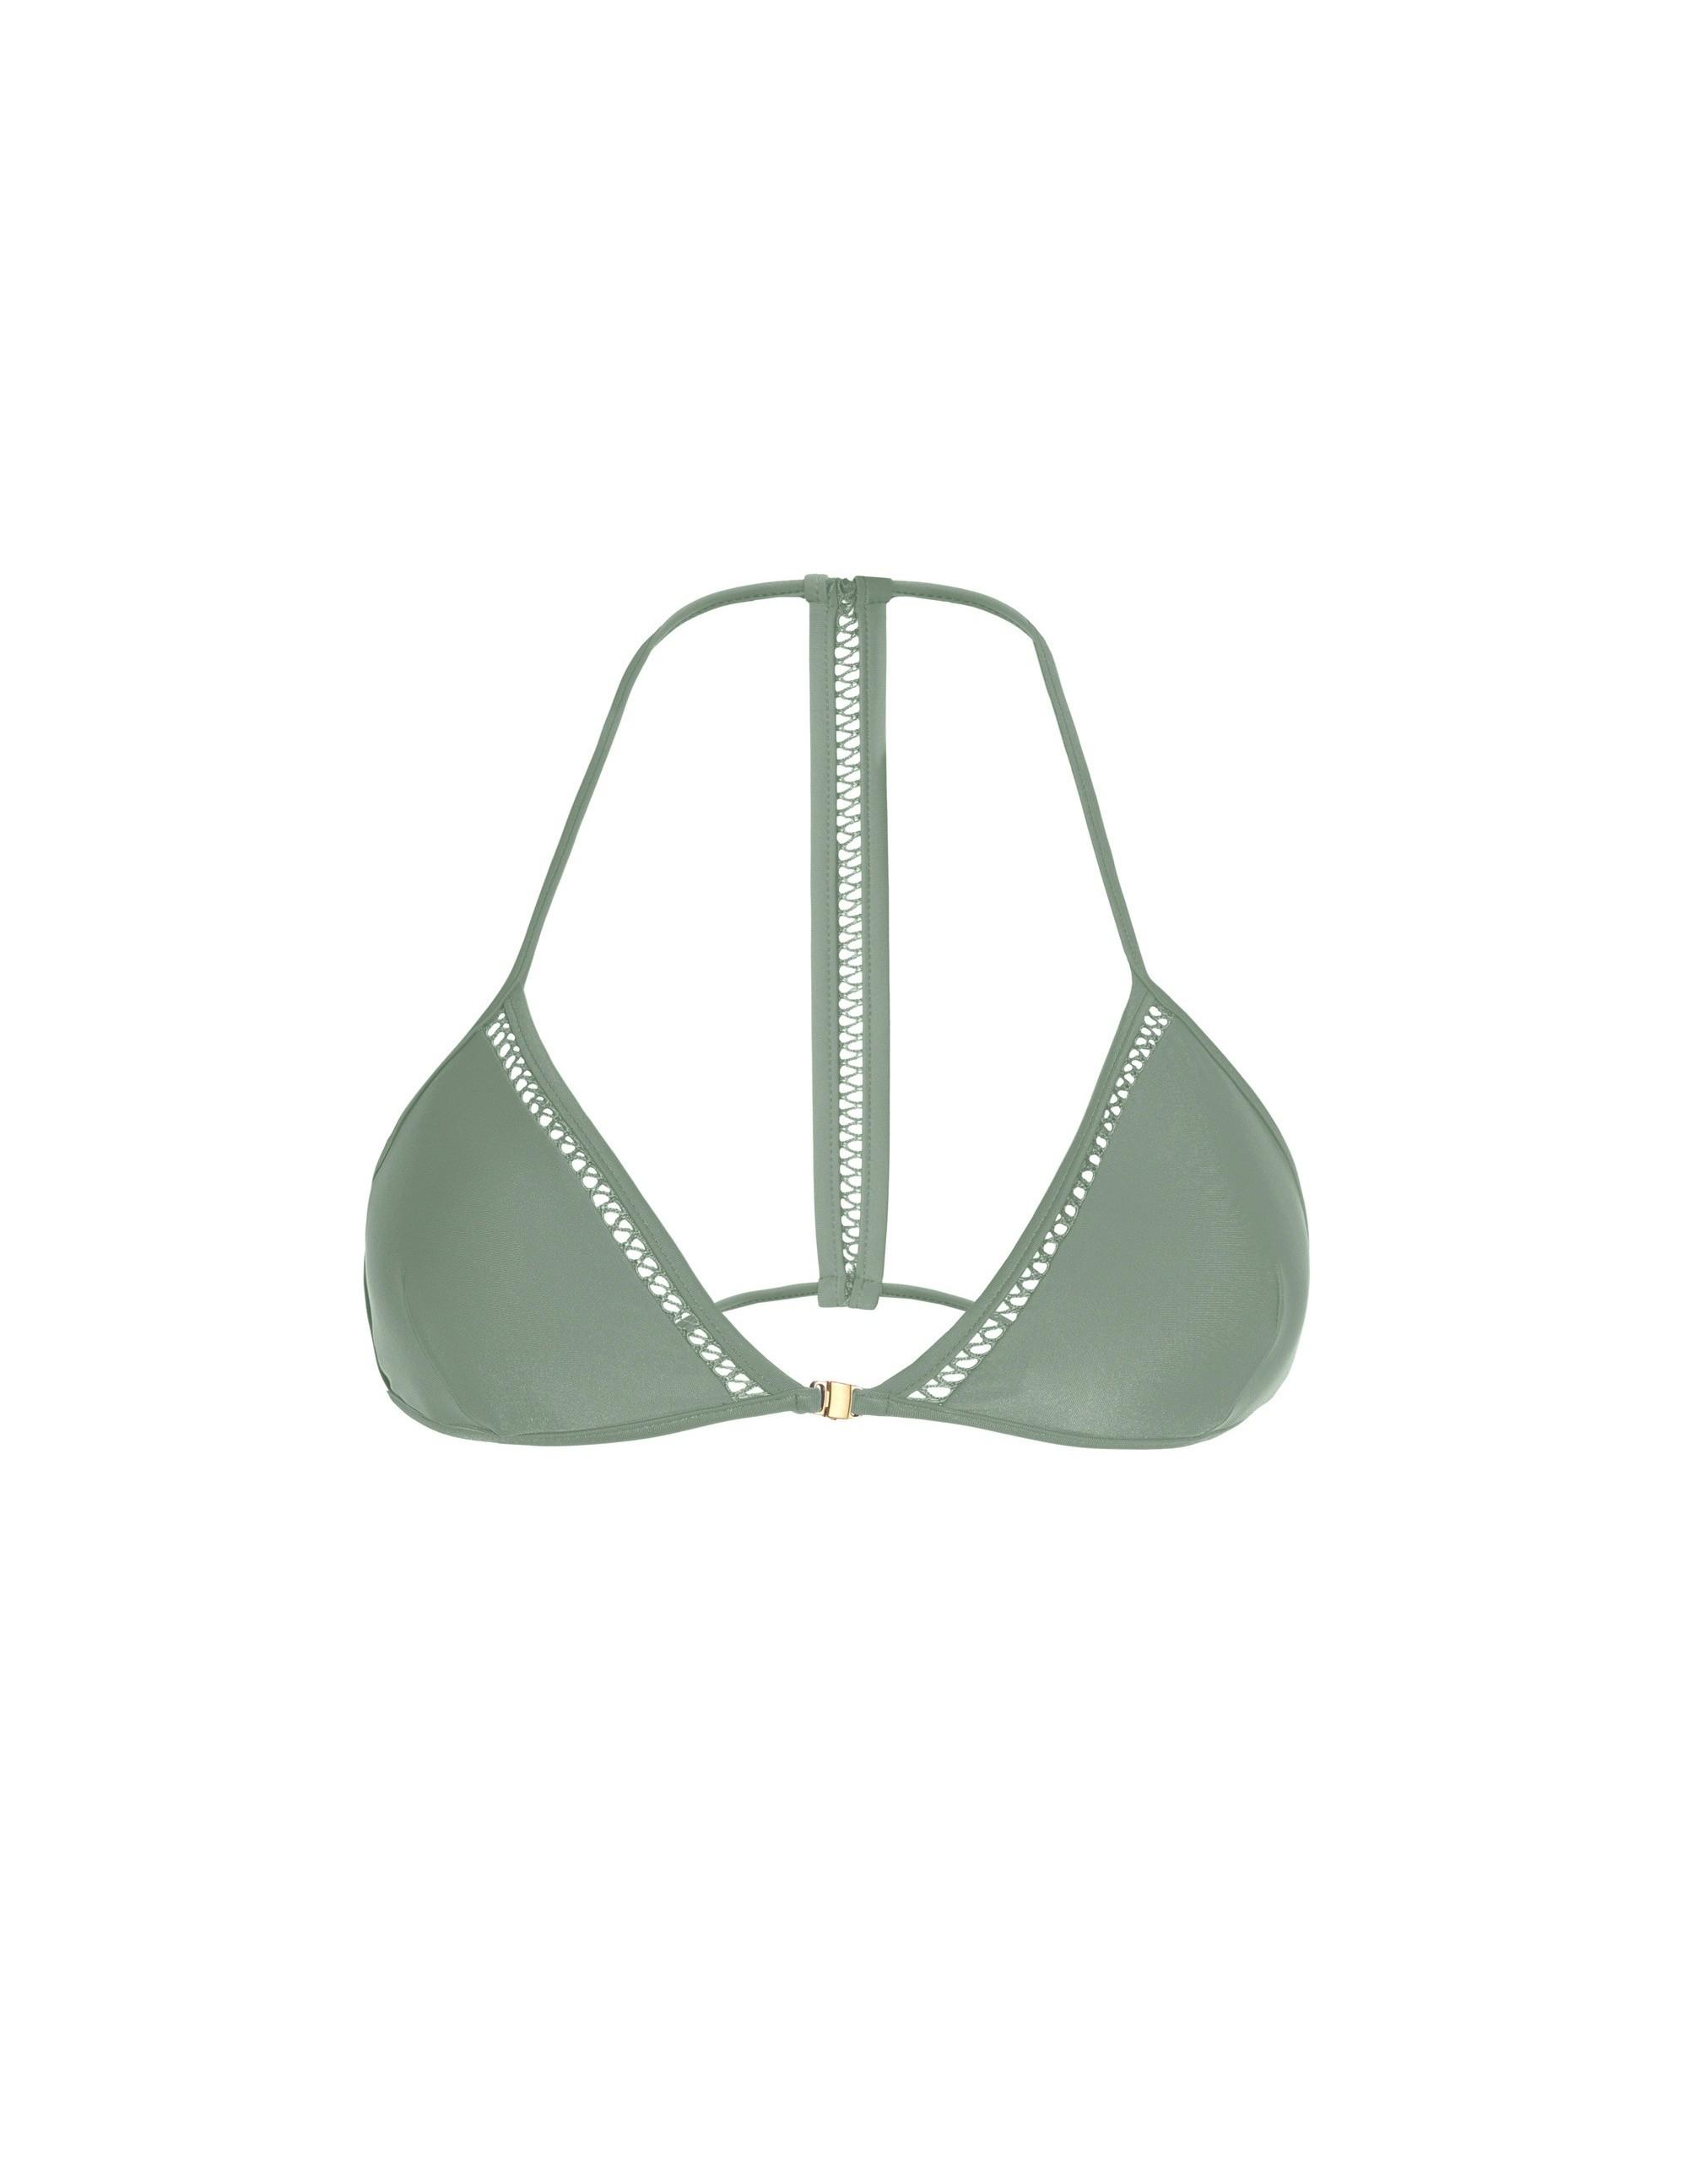 ANAMUR bikini top - SERENGETI